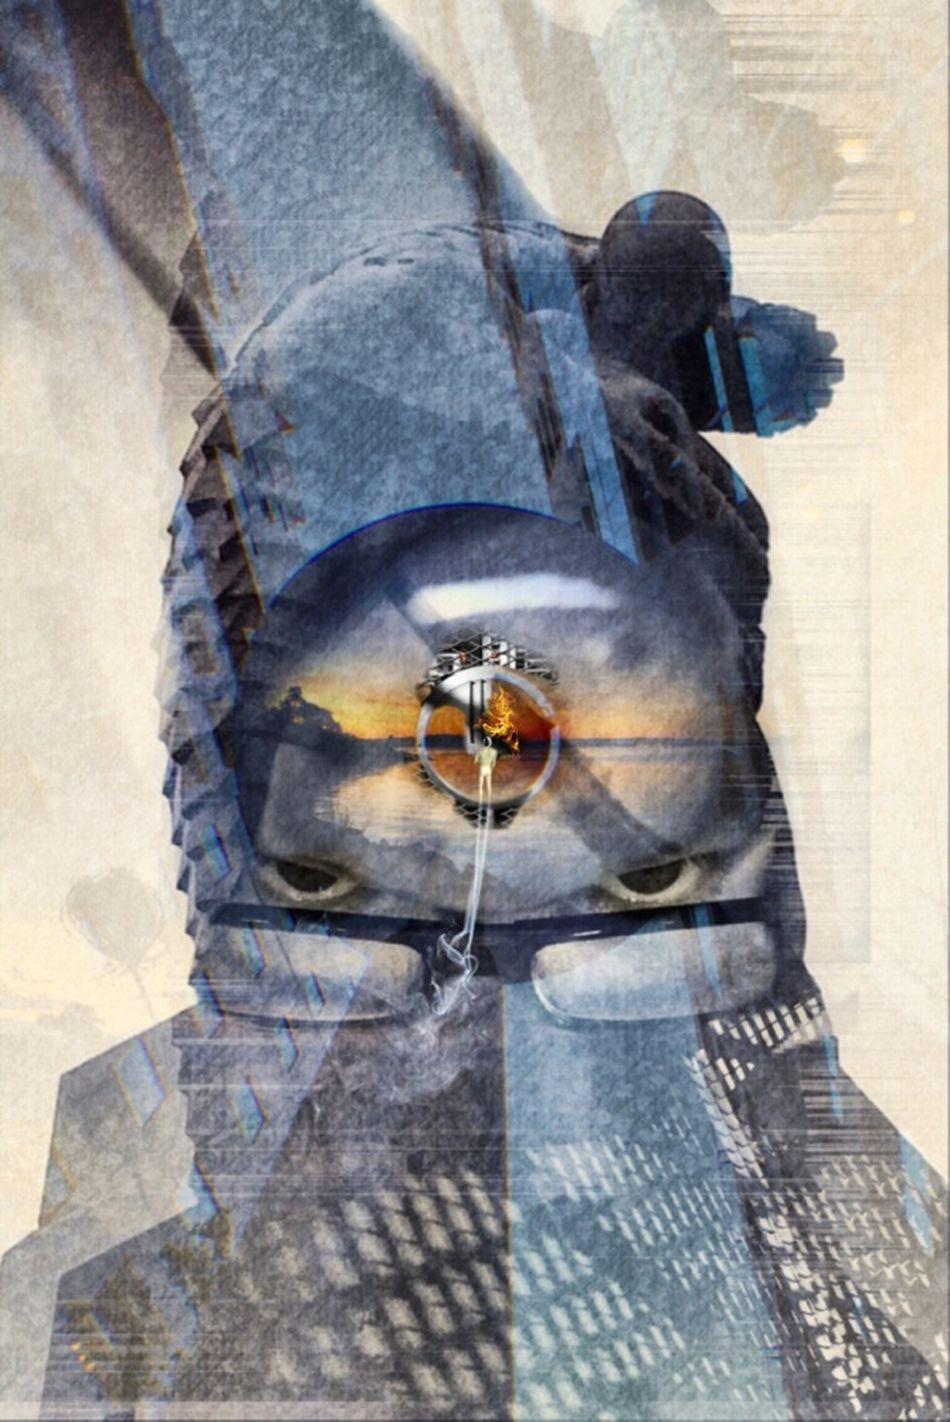 Azul NEM Self We Are Juxt TheMinimals (less Edit Juxt Photography) Surrealism